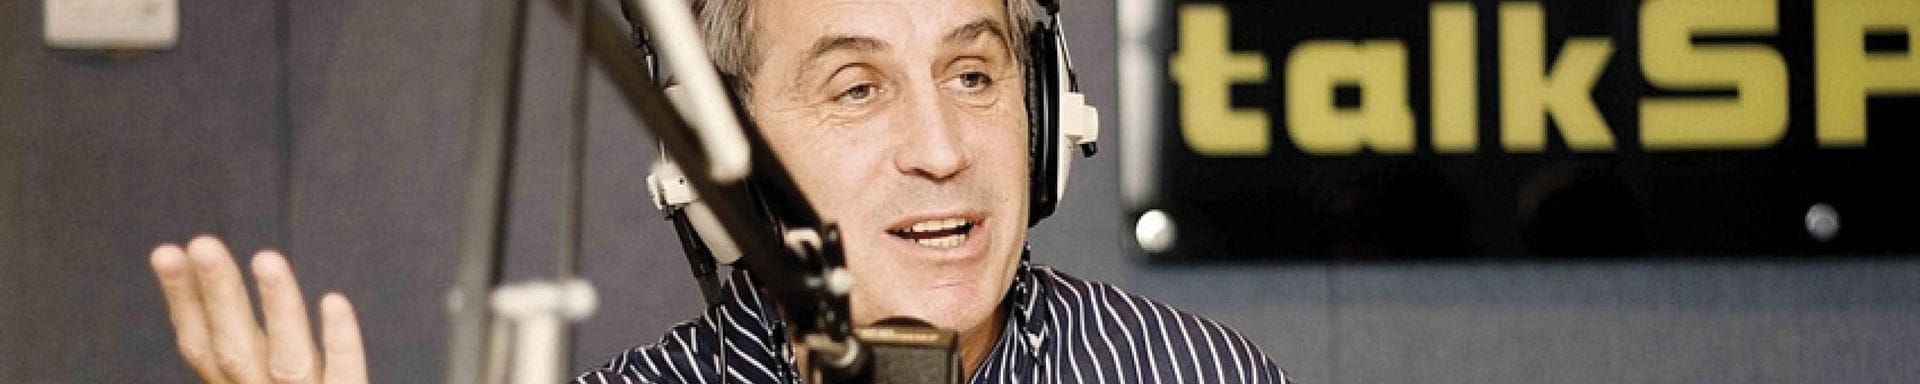 Champions Celebrity Radio Broadcasting